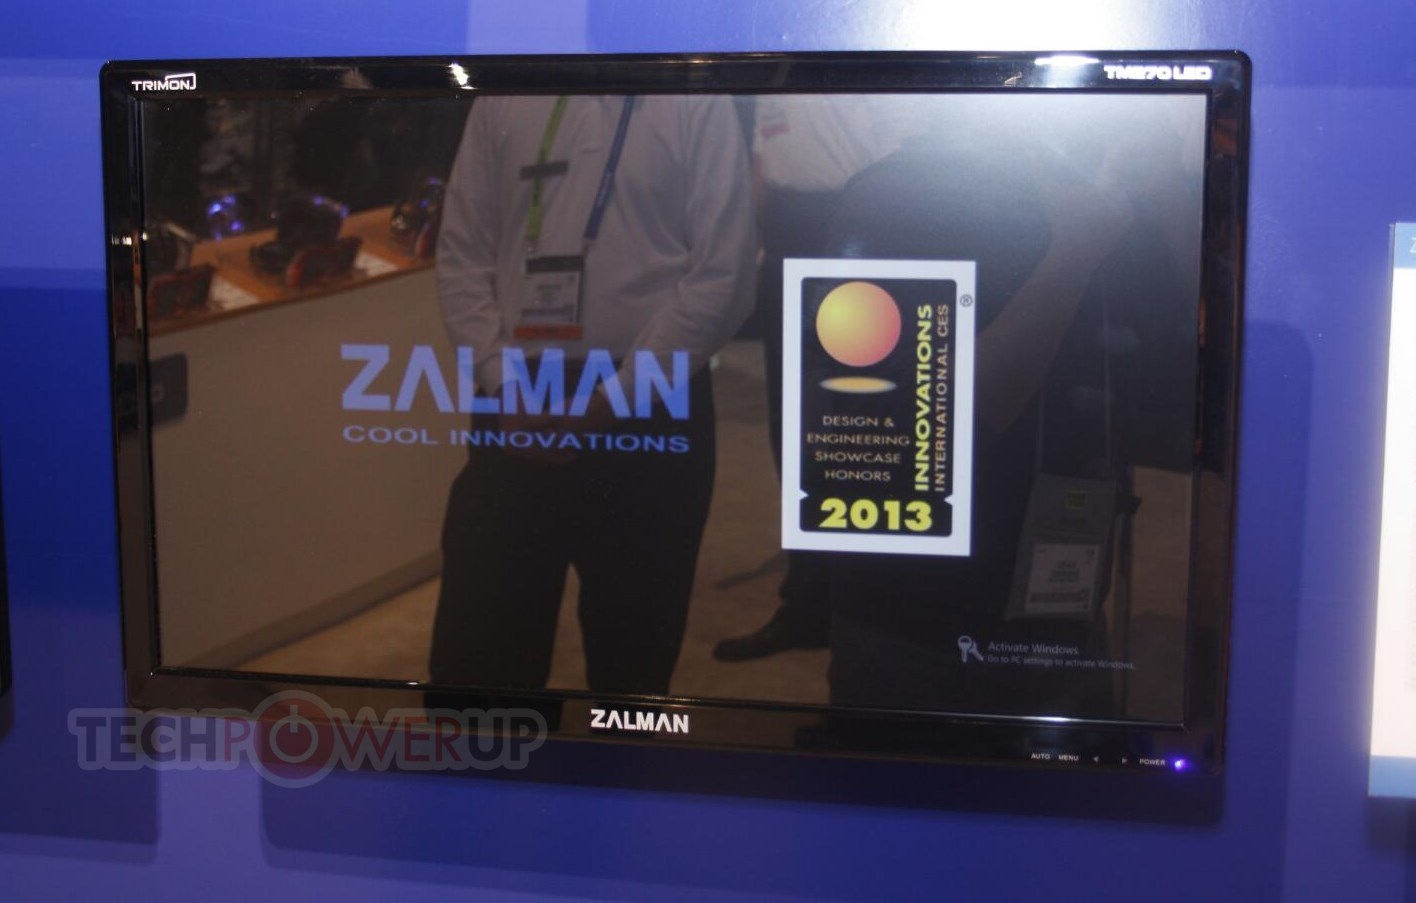 Zalman TM270VA